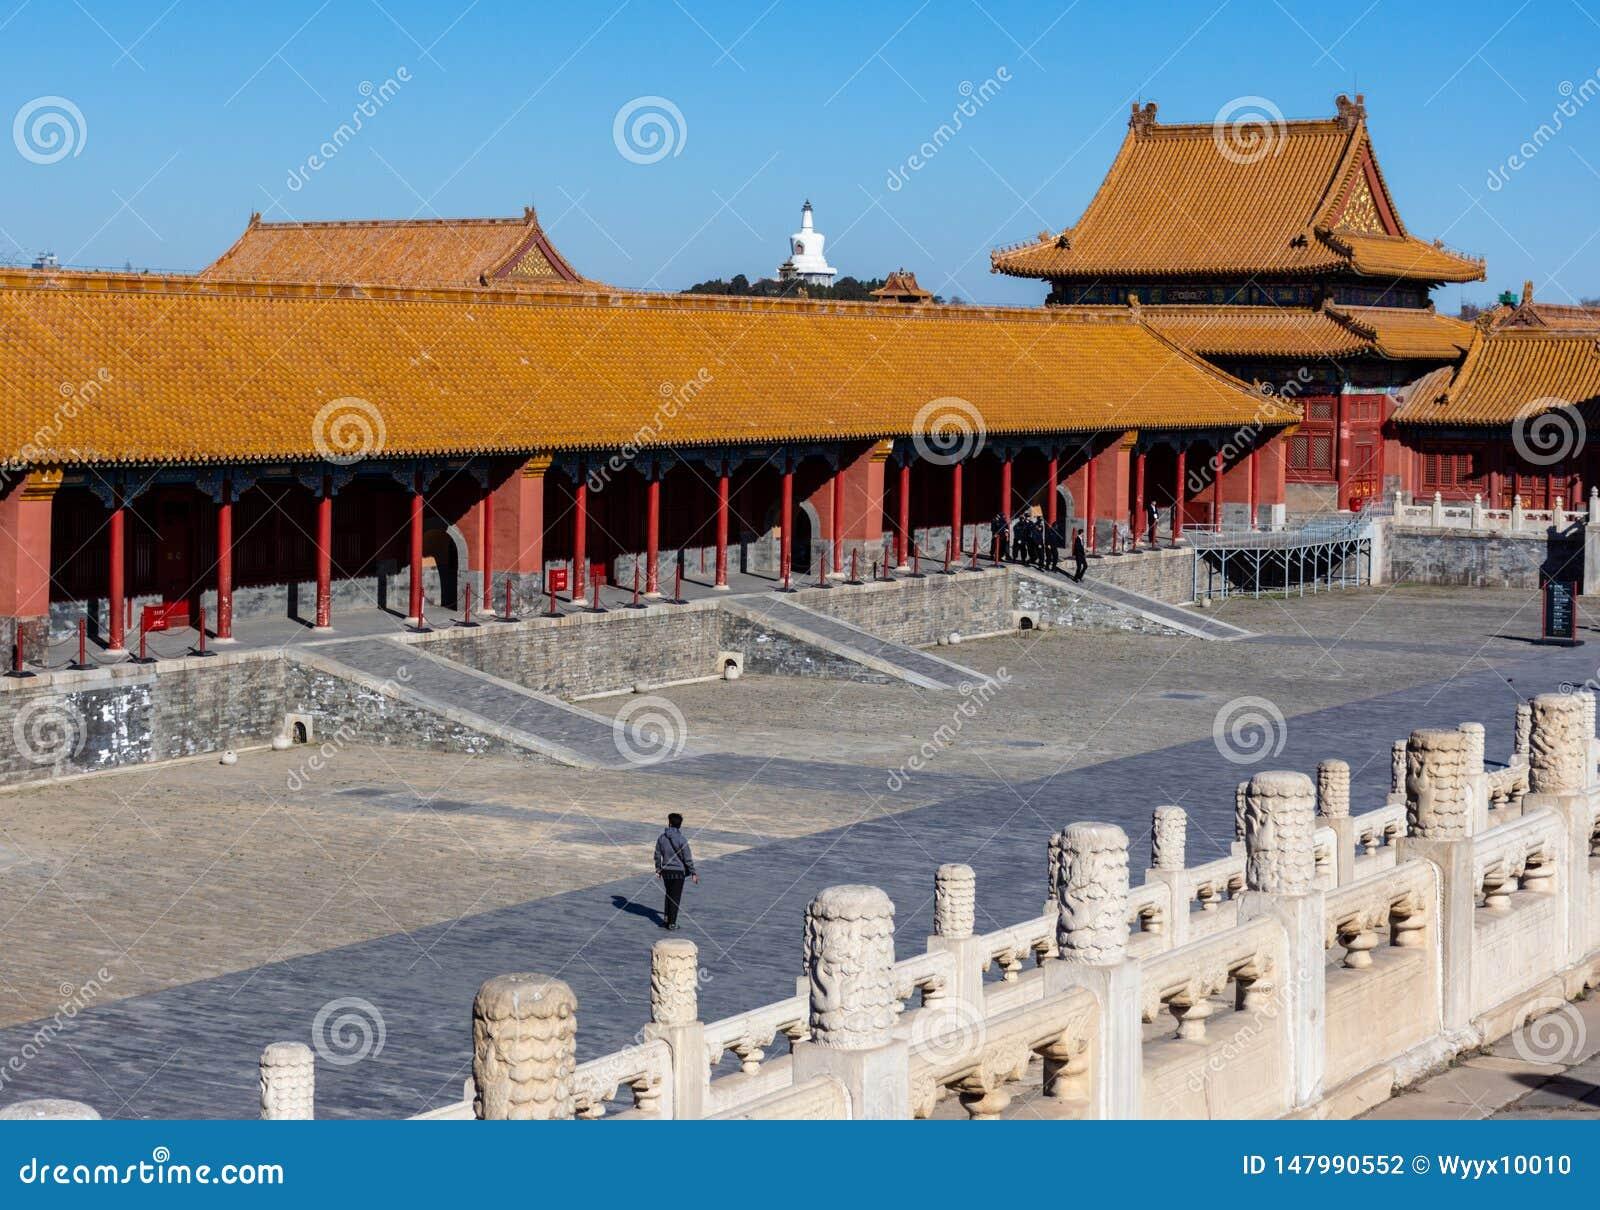 Beijing Palace Museum, China